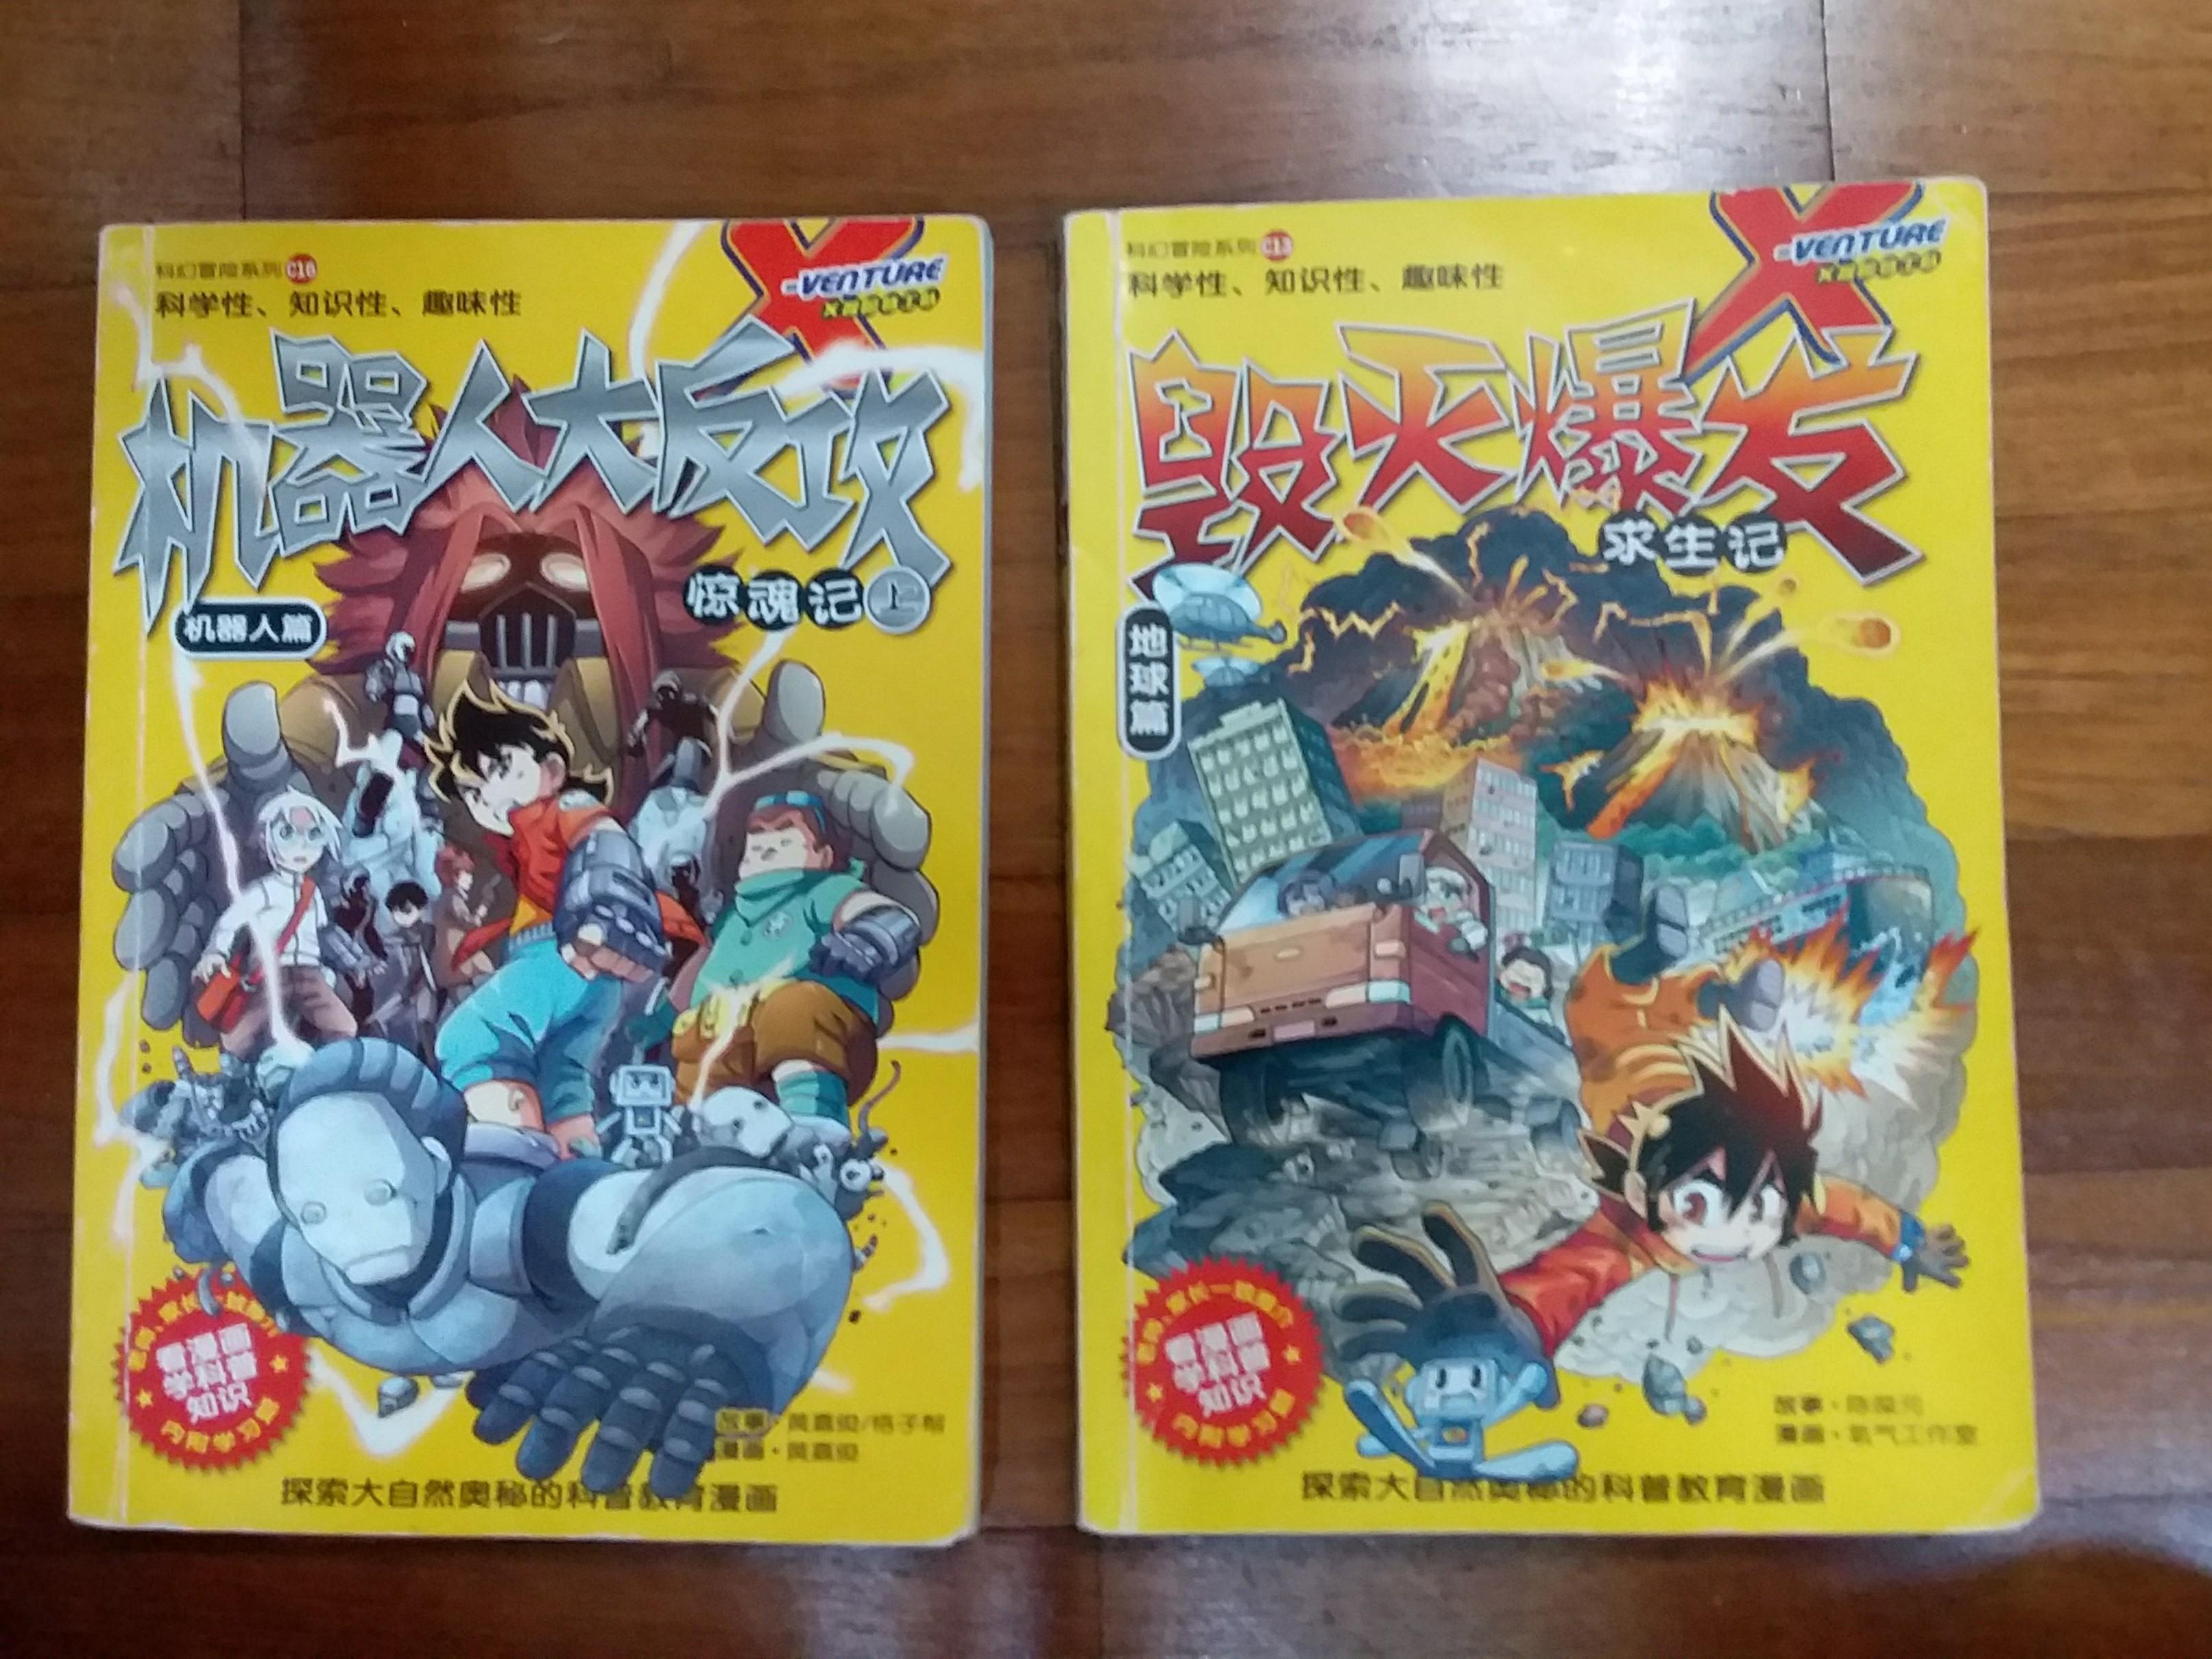 X- VENTURE Comic books